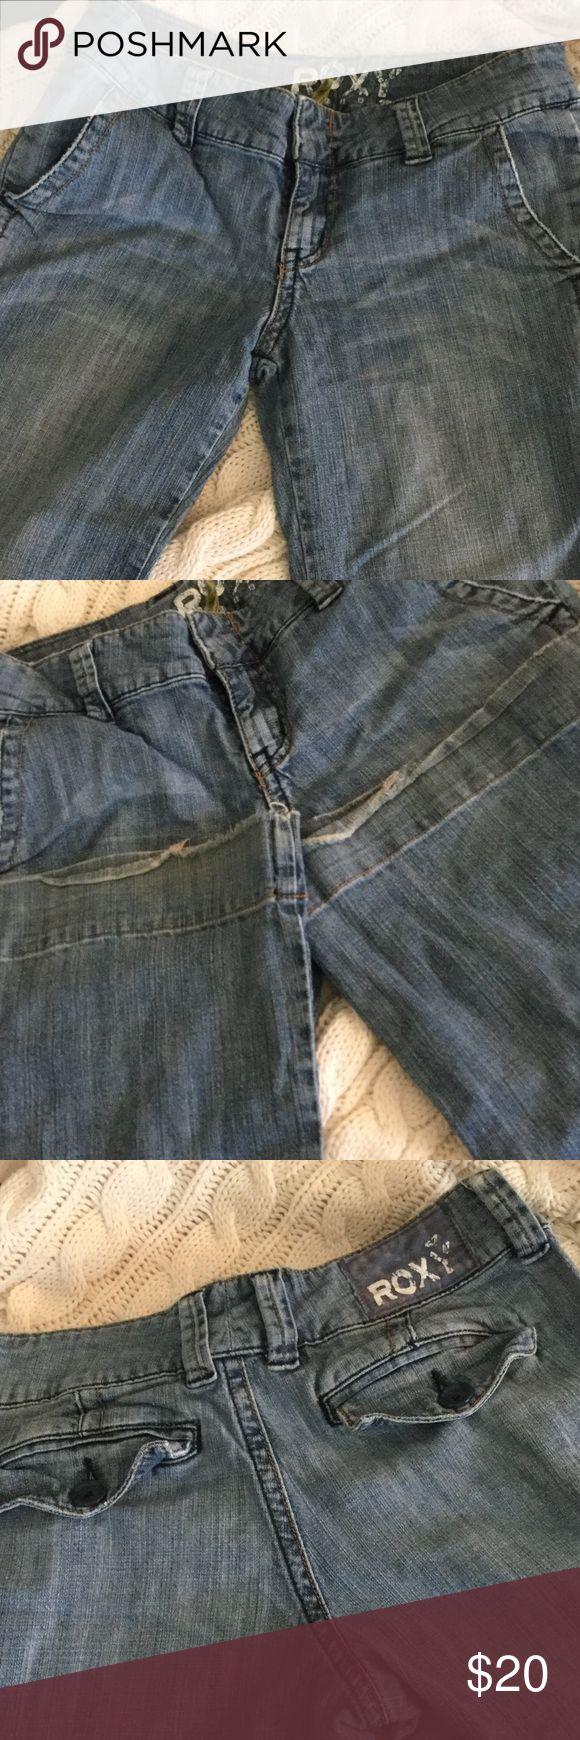 Roxy women's wide-legged trouser jeans Excellent condition, flap pockets Roxy Jeans Flare & Wide Leg